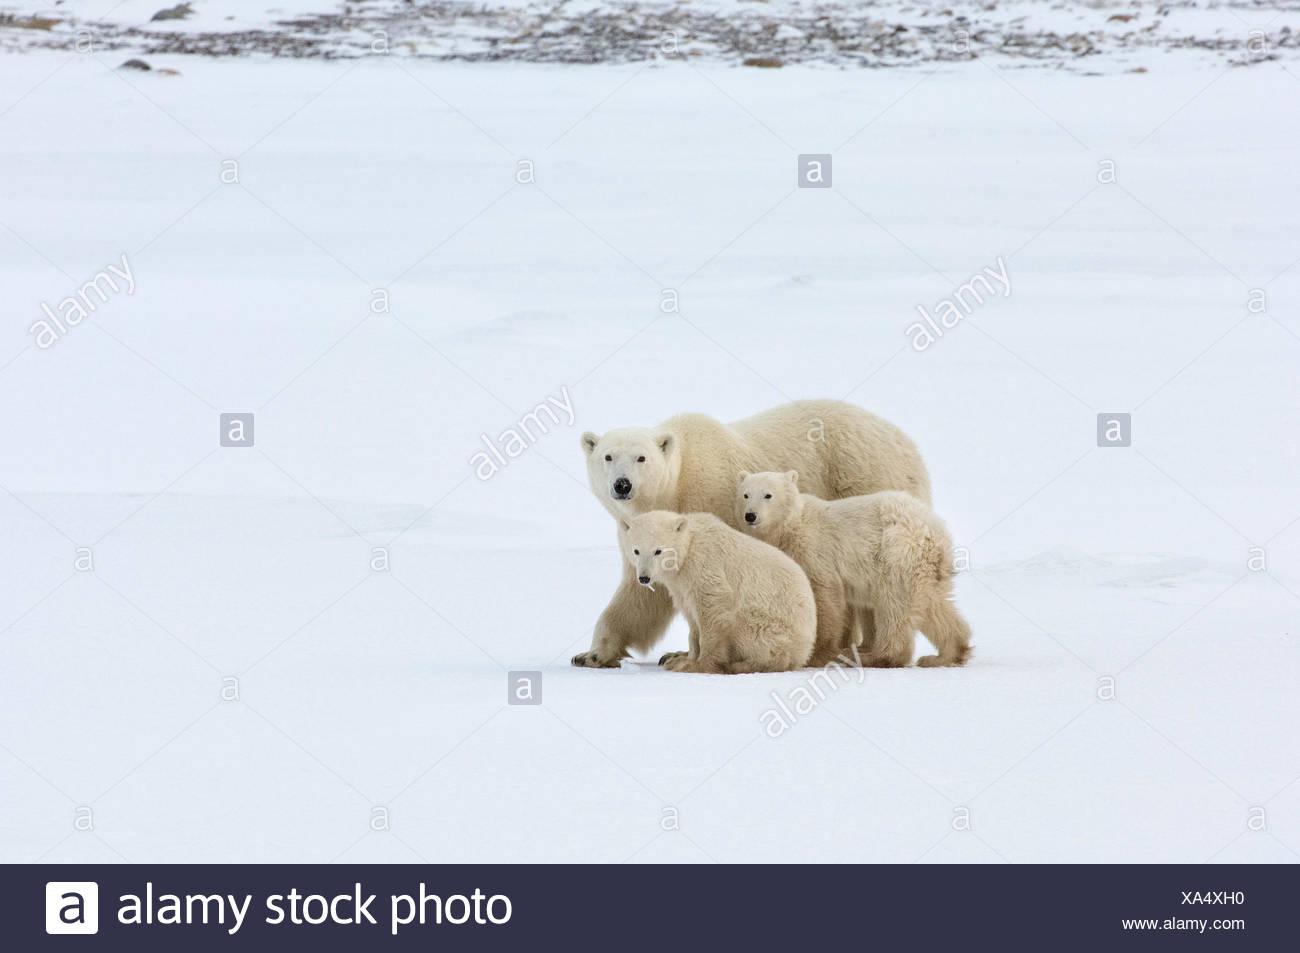 Cute Wild Animal Baby Stockfotos & Cute Wild Animal Baby Bilder ...